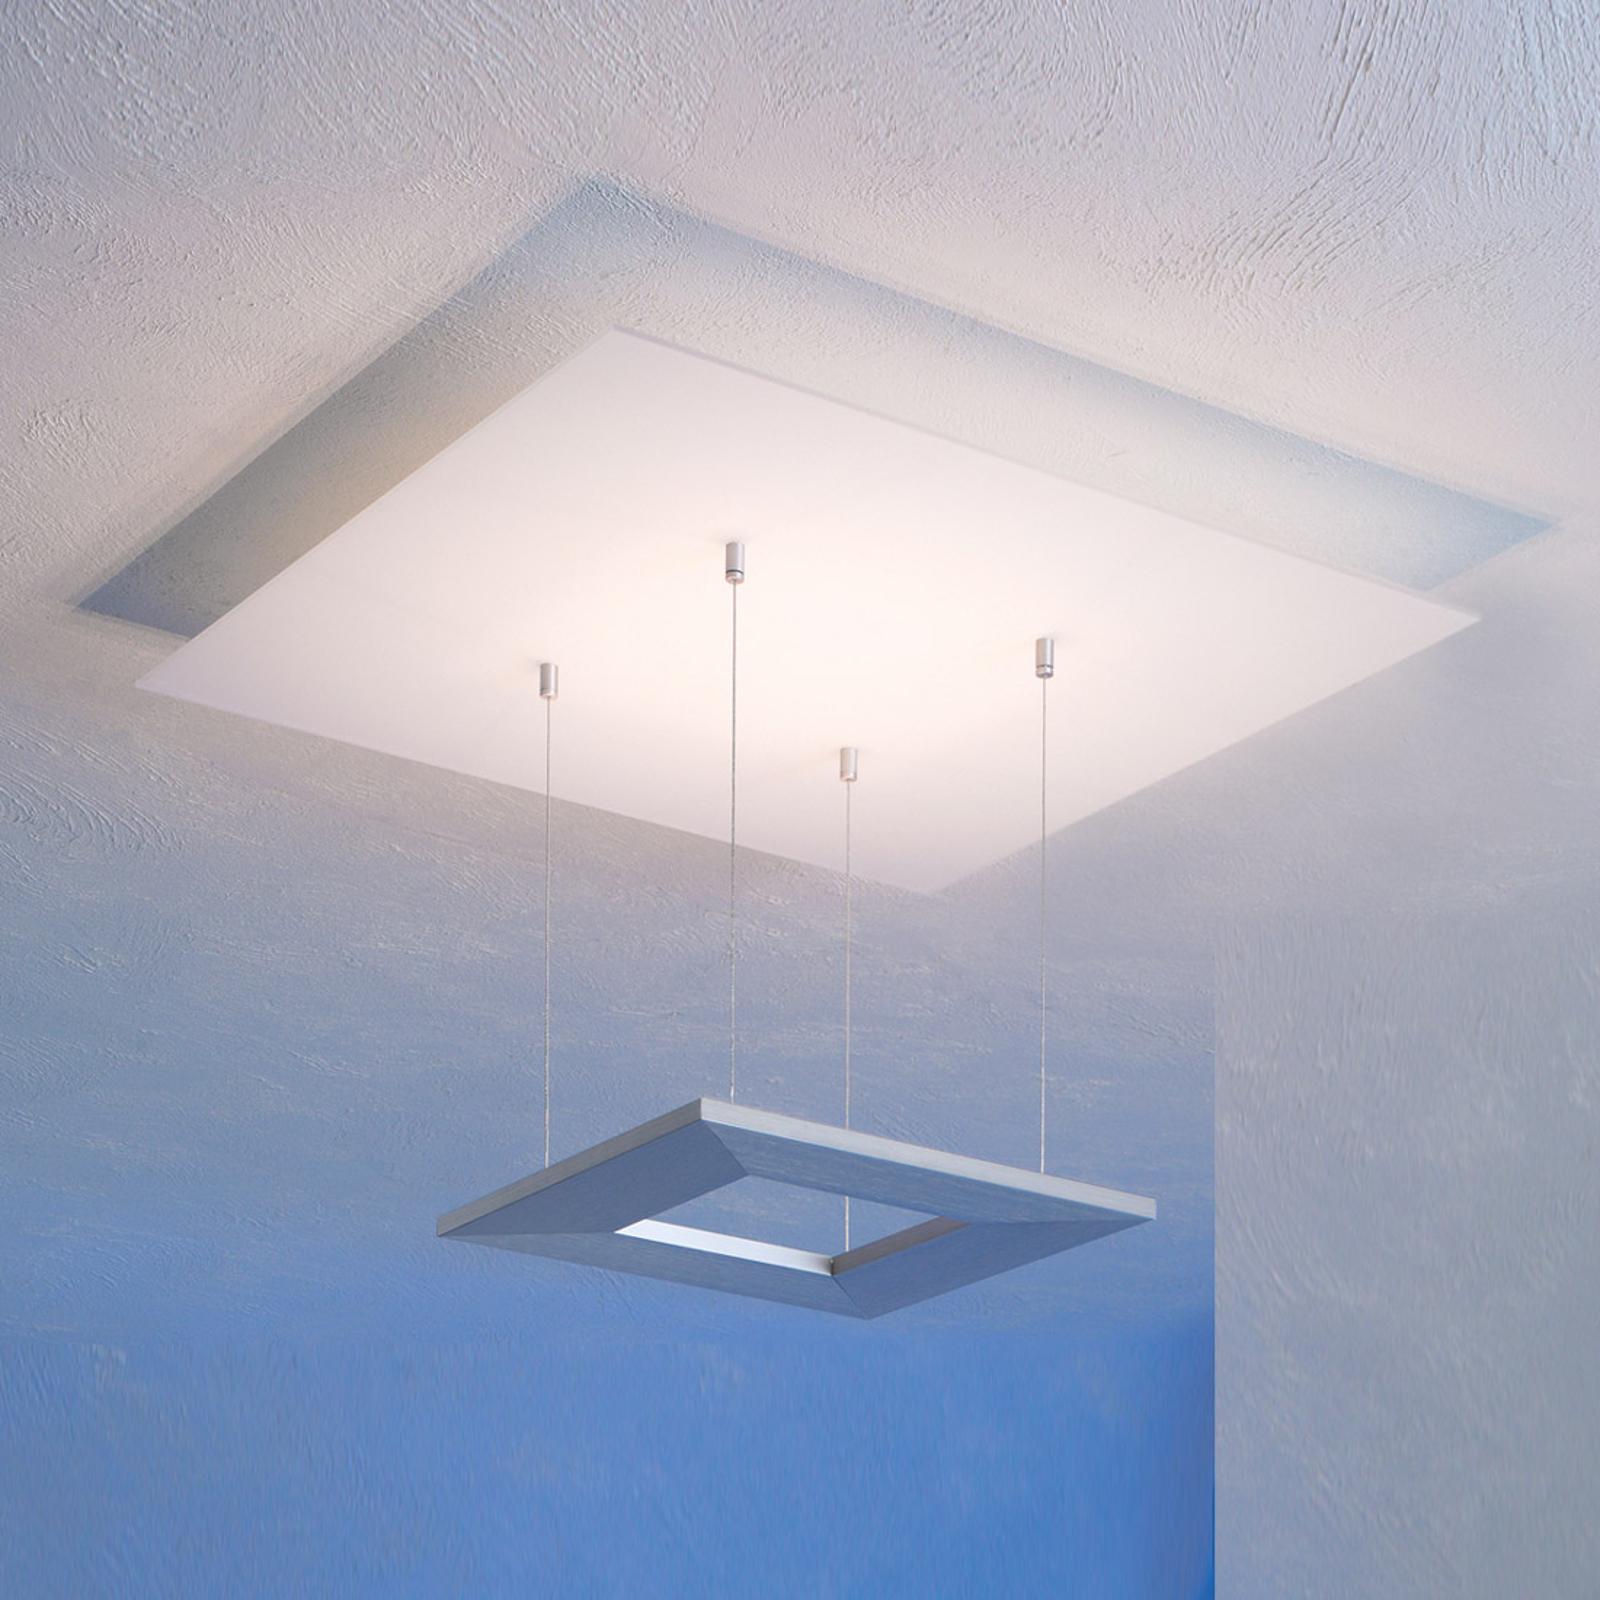 Escale Zen - LED-Deckenleuchte, 60 cm, alu